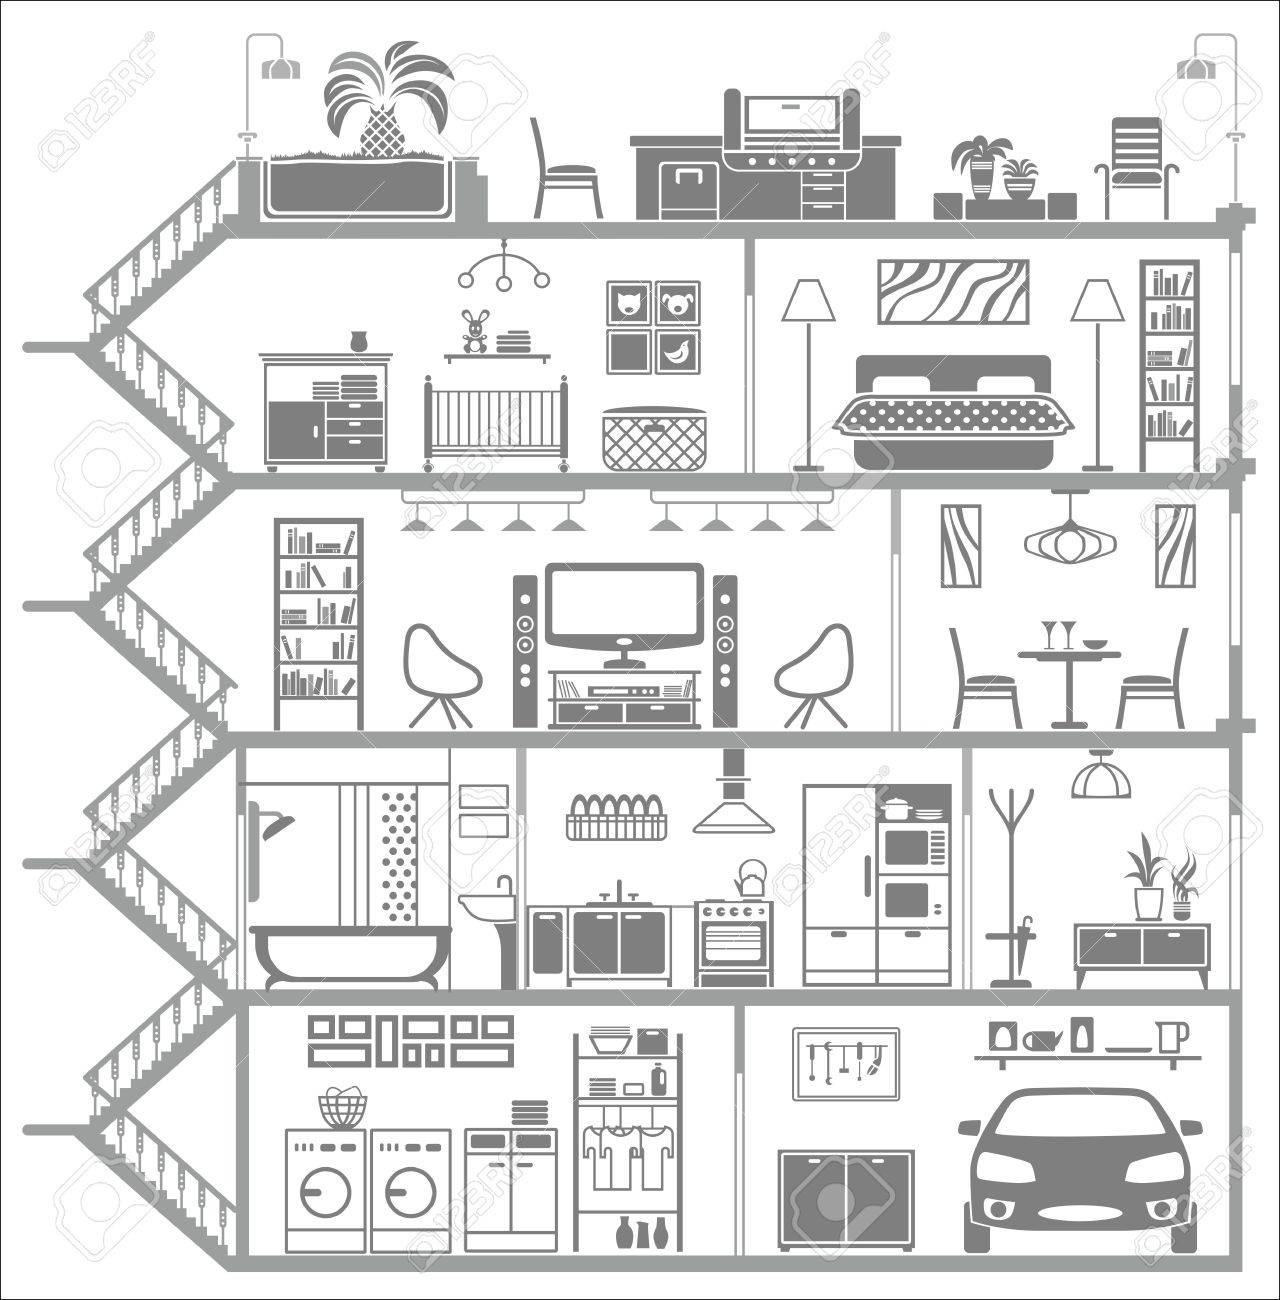 house interior silhouette illustration Stock Vector - 26590188